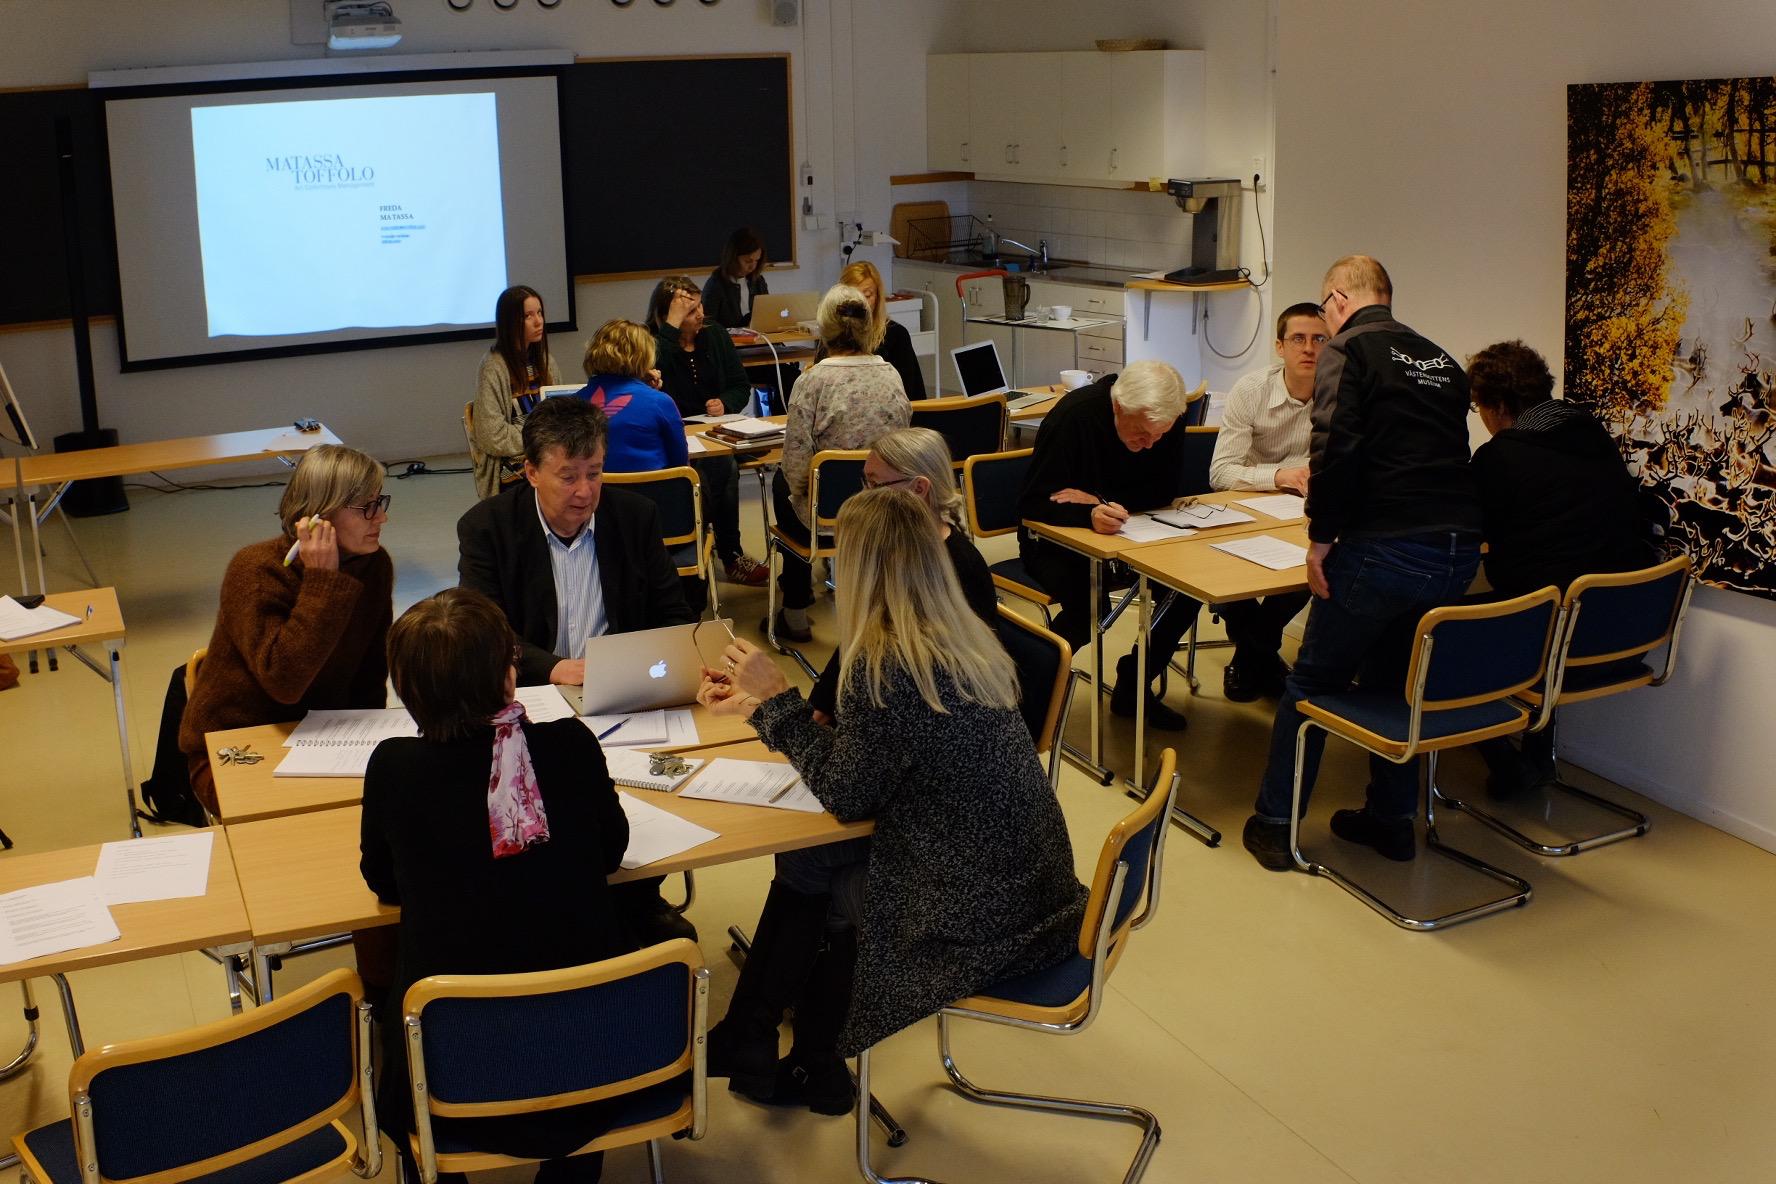 Matassa Toffolo workshop at Västerbottens Museum